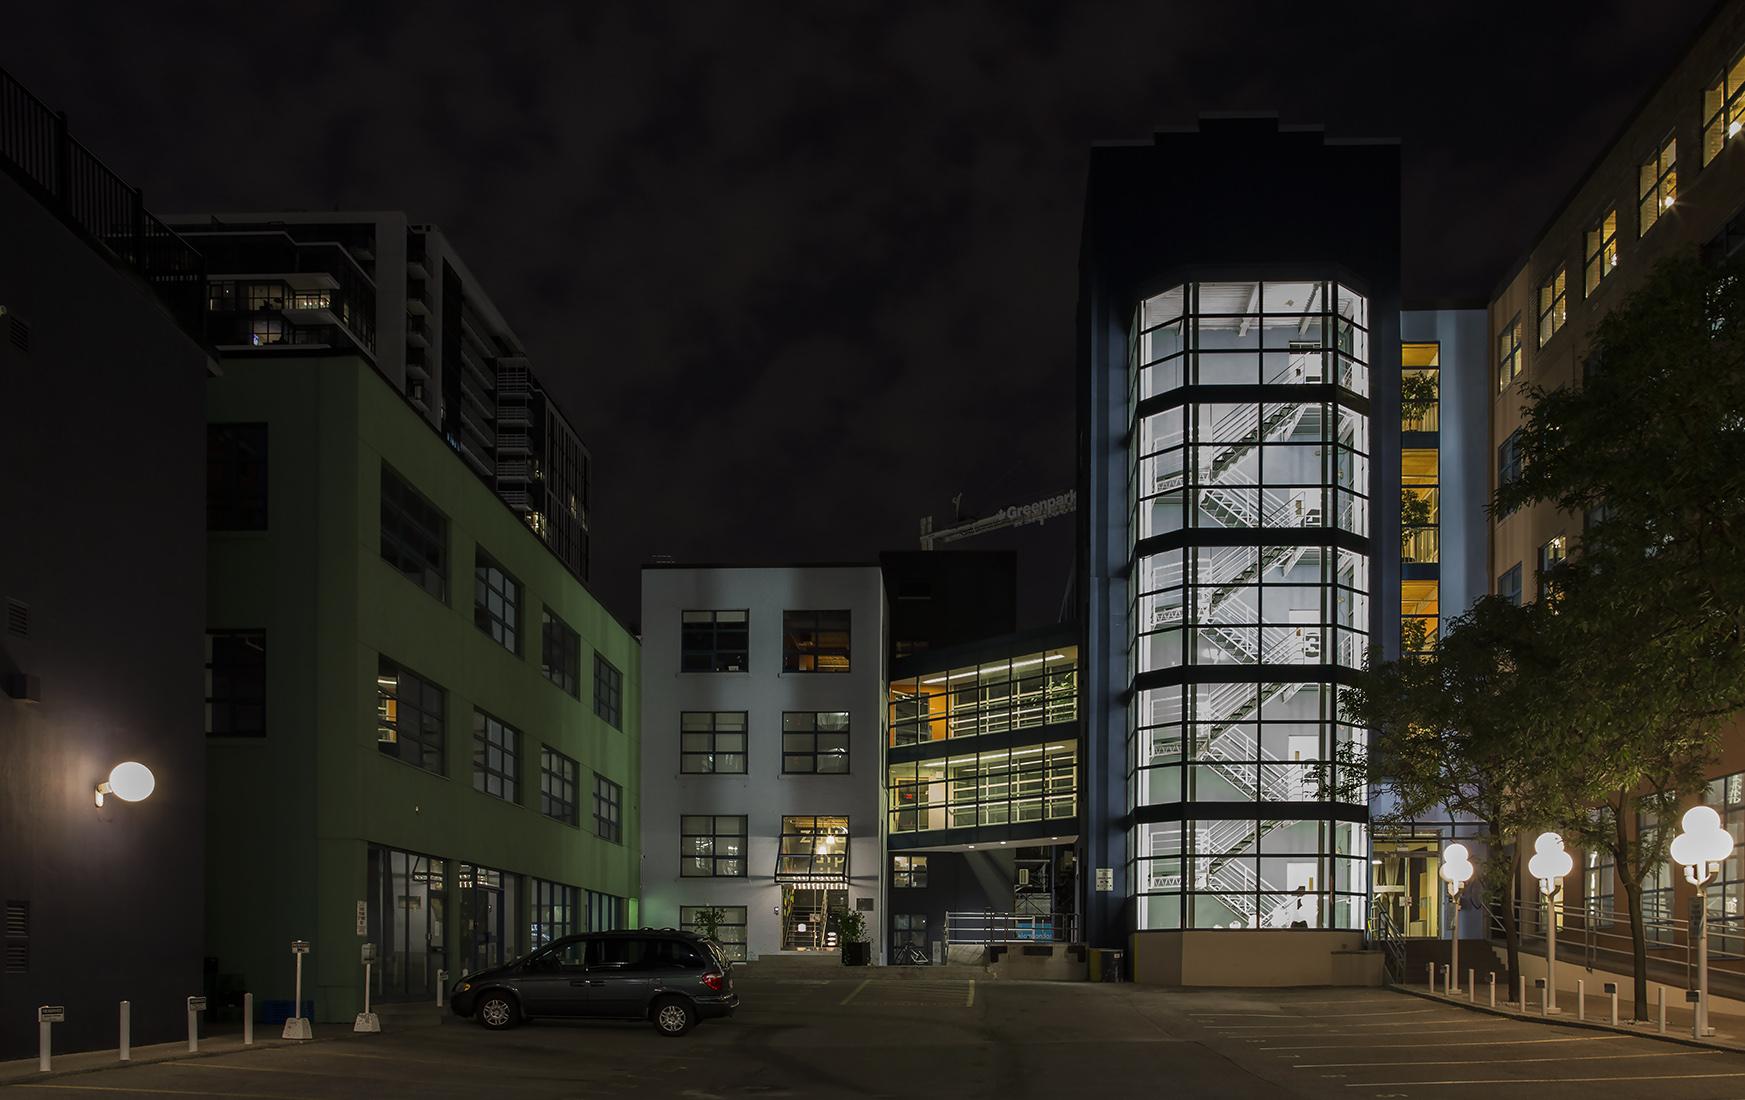 20160921. The unique Ontario Design Centre three building comple